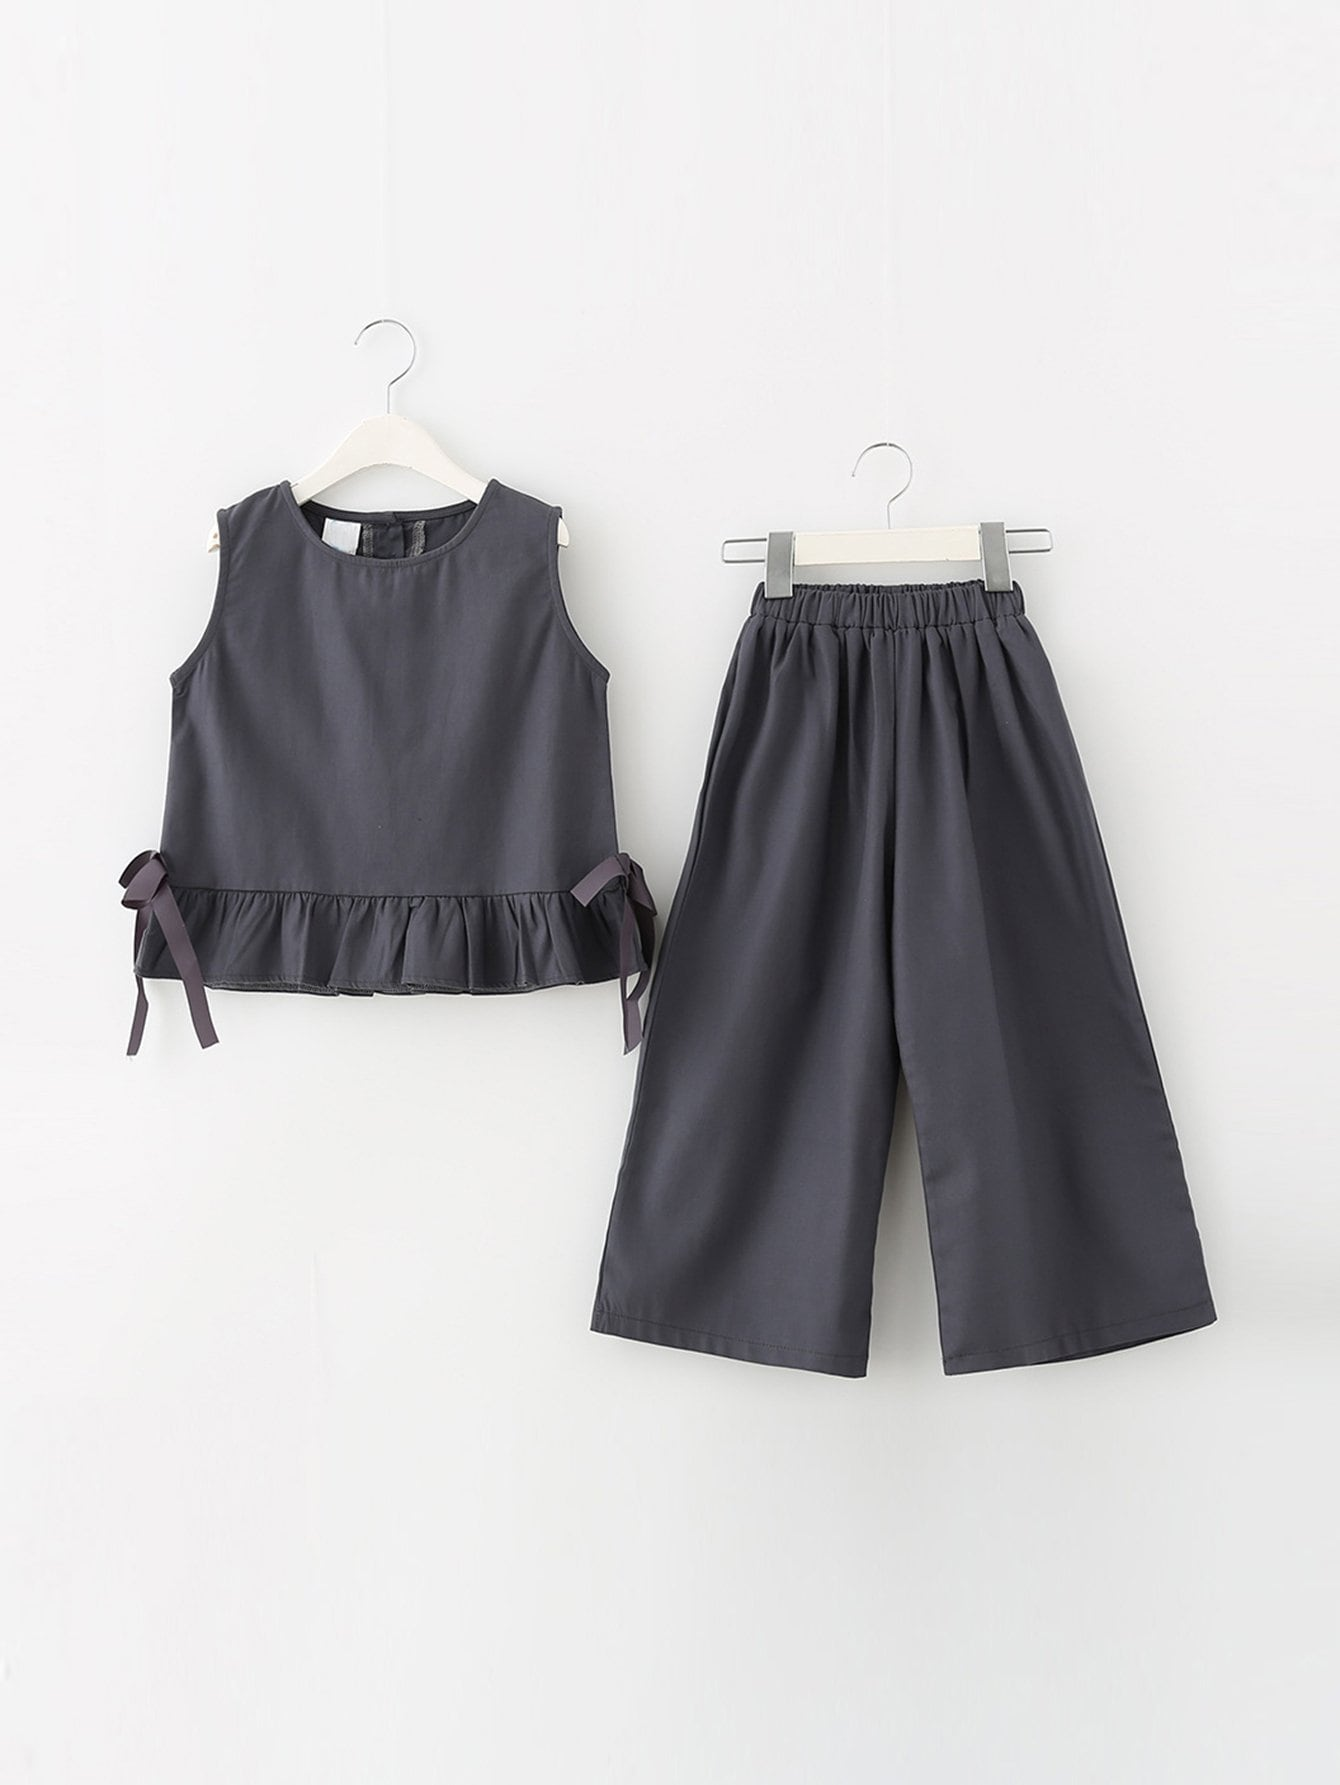 Топ с оборками и широкие брюки для детей от SheIn